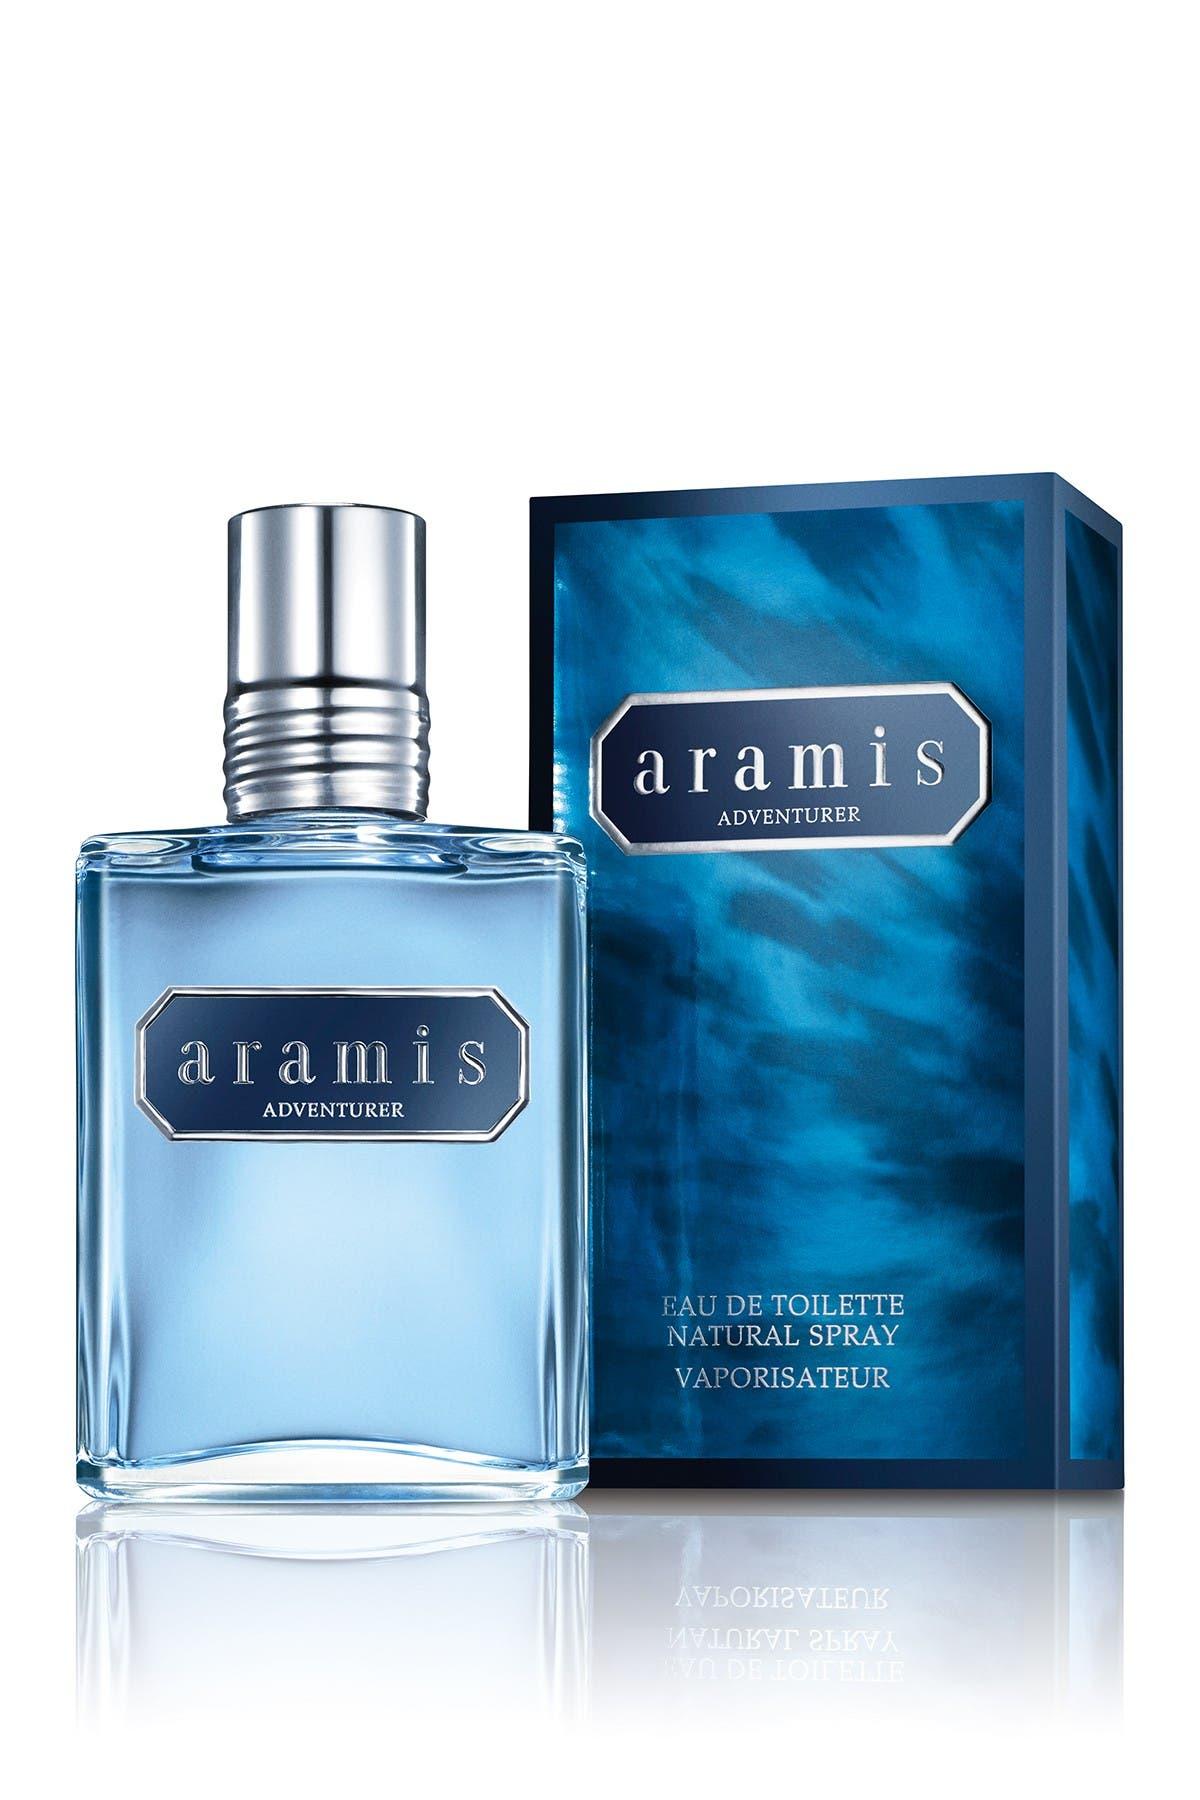 Aramis Adventurer Eau De Toilette Natural Spray